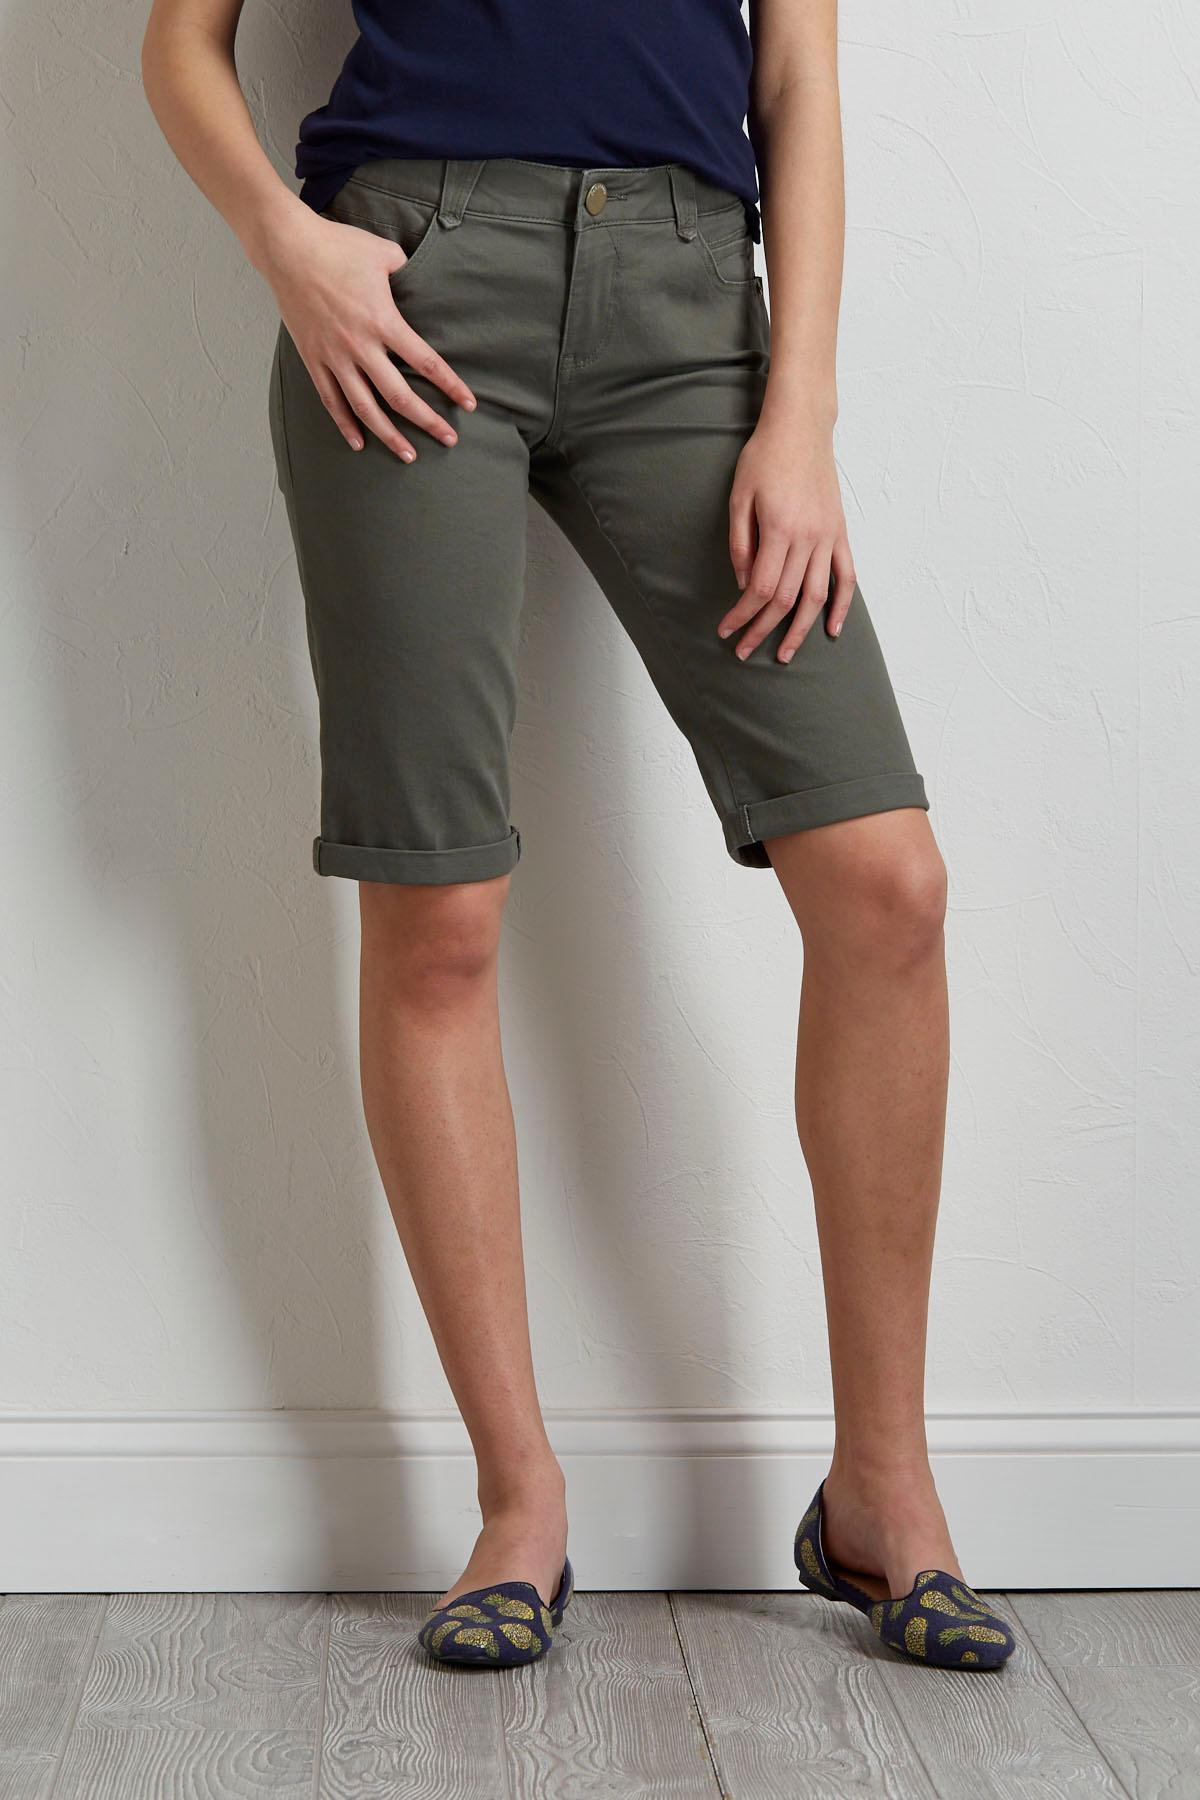 Olive Bermuda Shorts